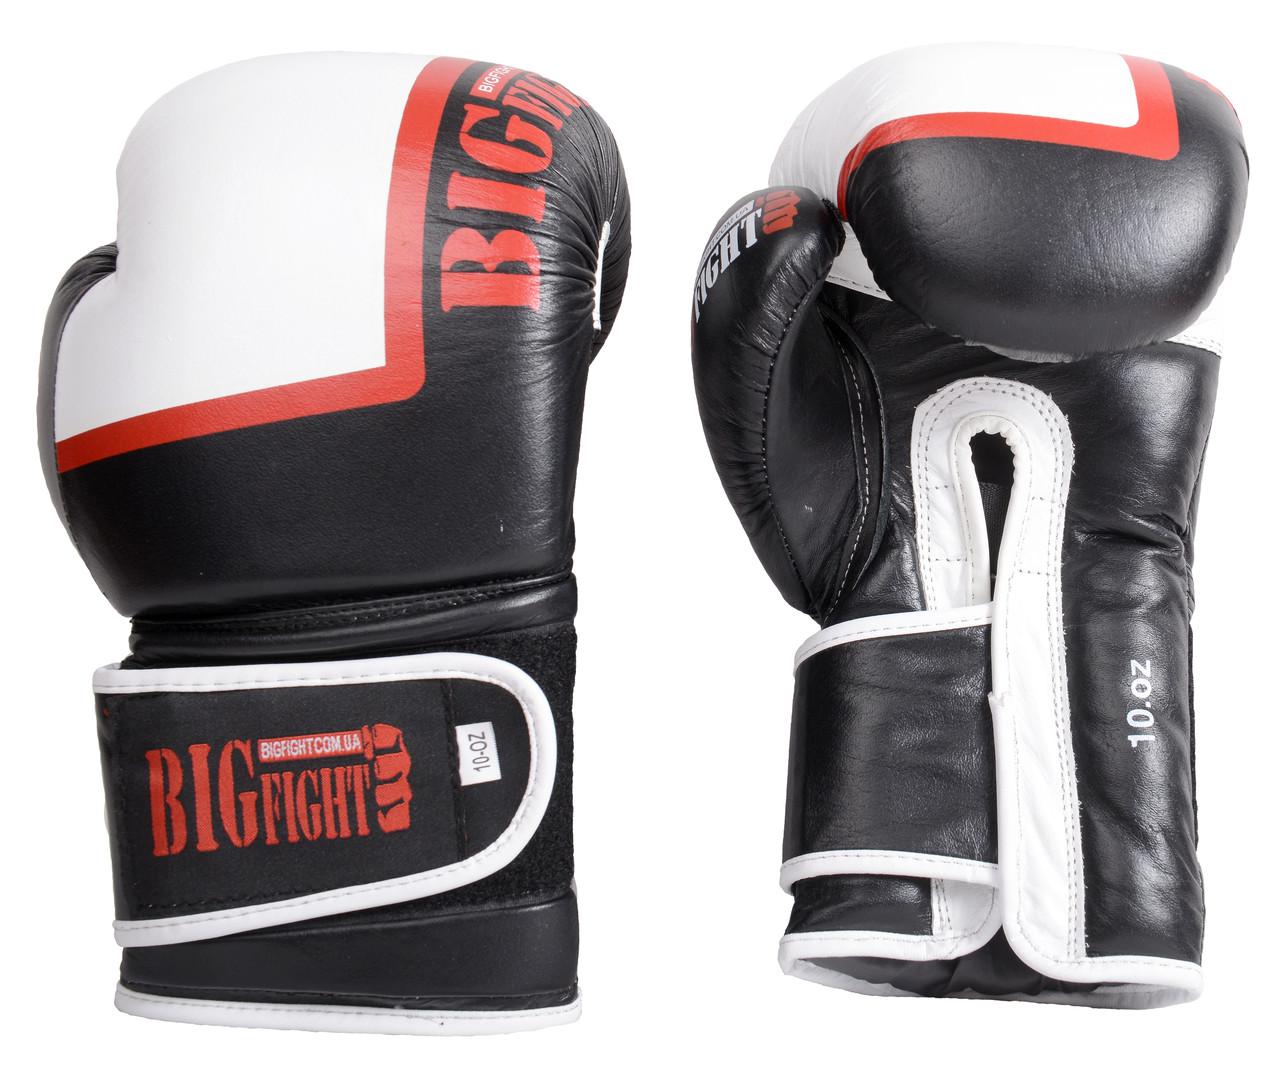 Боксерские перчатки черно-белые BigFight 20ун кожа